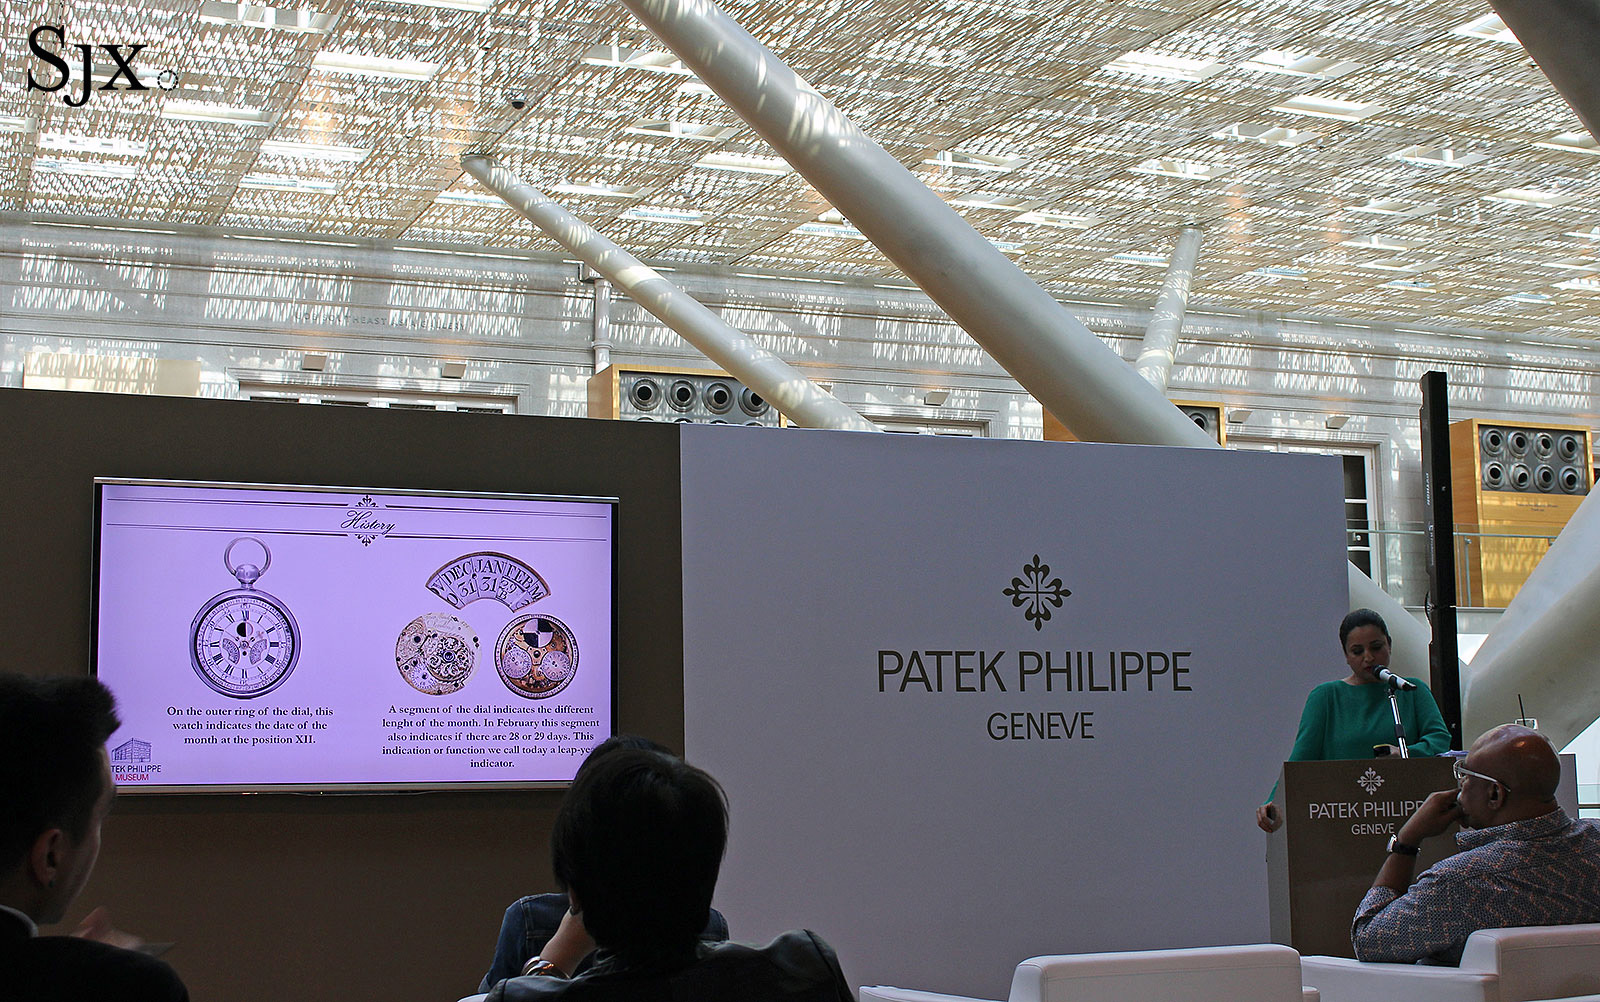 Patek Philippe perpetual calendar seminar Singapore 2017